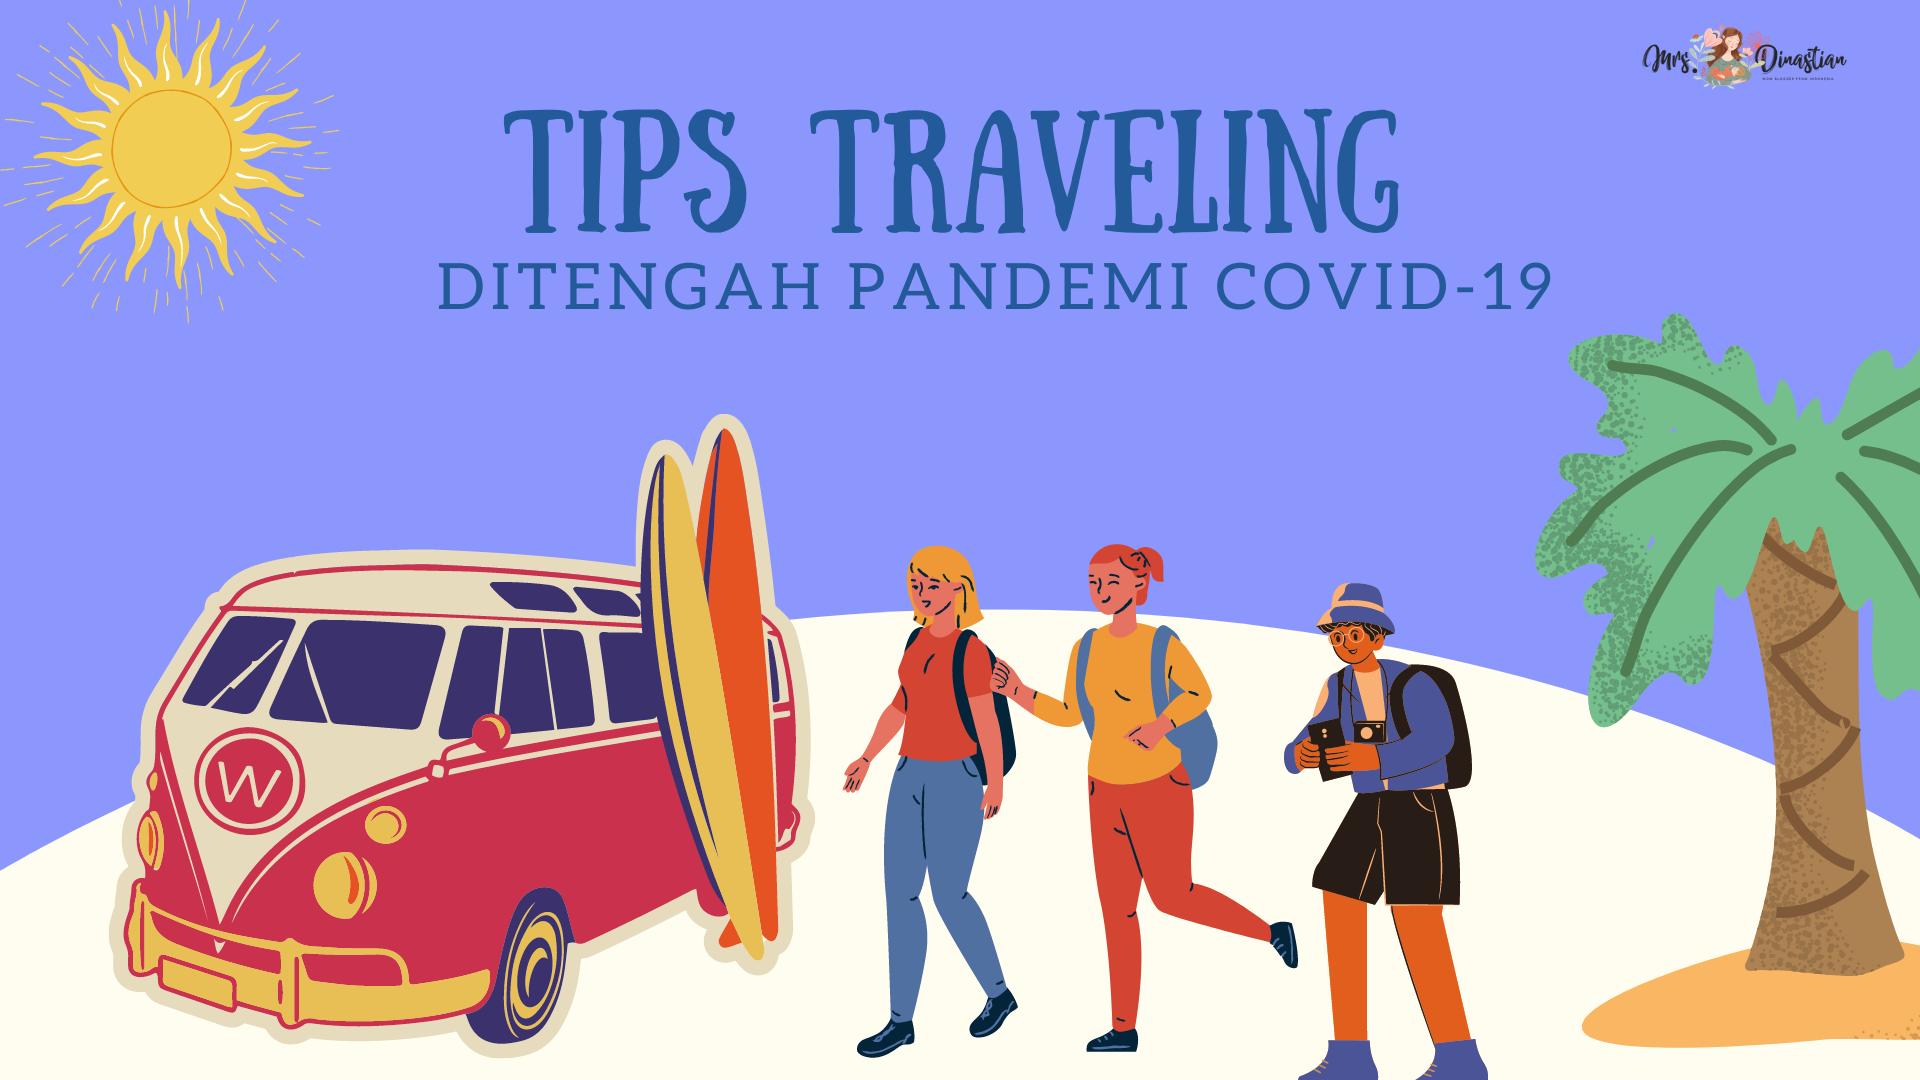 Tips Traveling ditengah pandemi covid-19